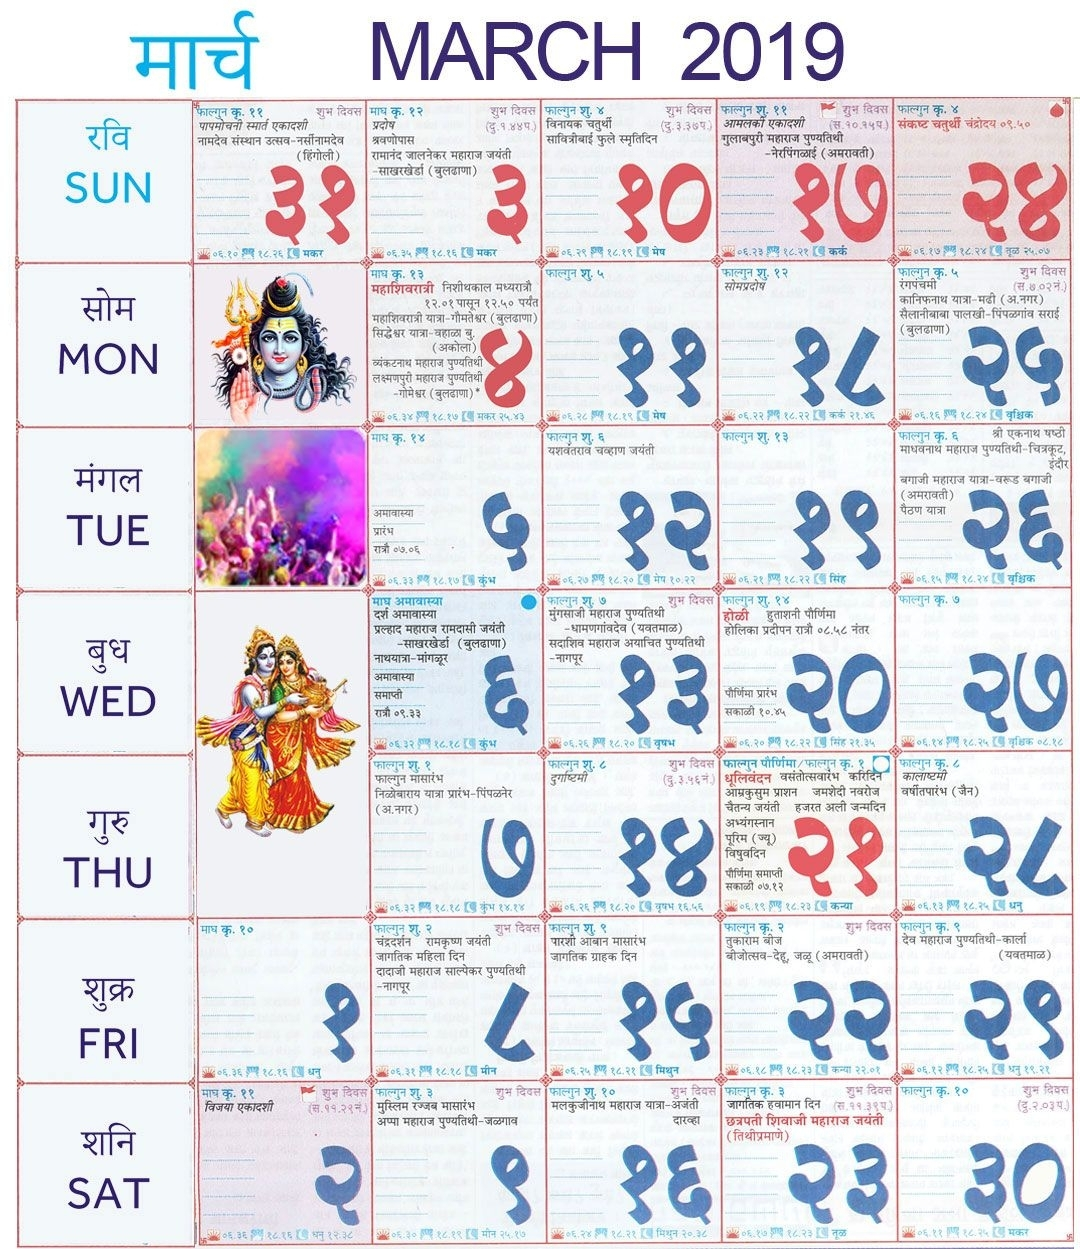 March 2019 Calendar Marathi | 2019 Calendar, Calendar March